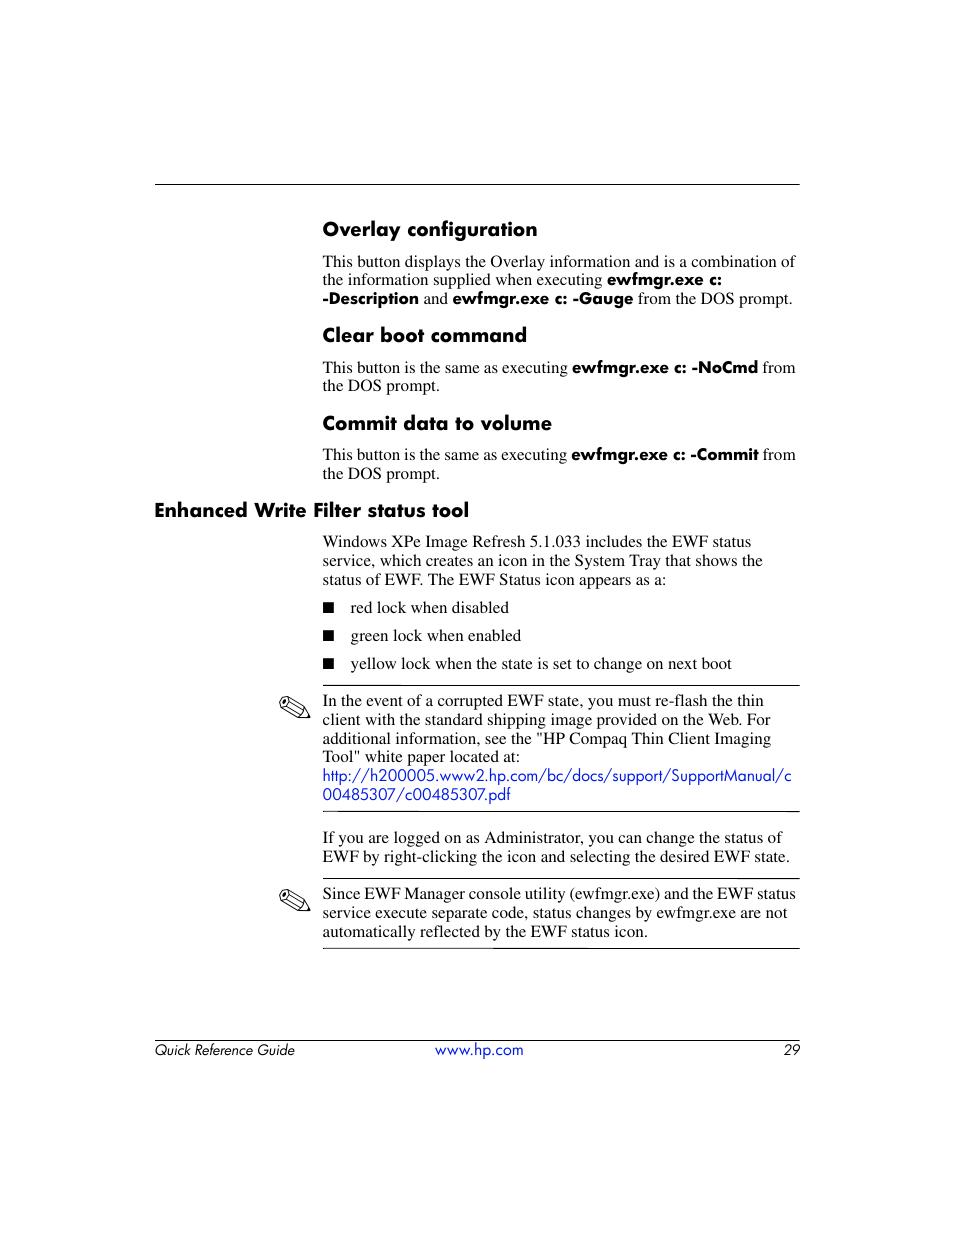 Enhanced write filter status tool   HP T5000 User Manual